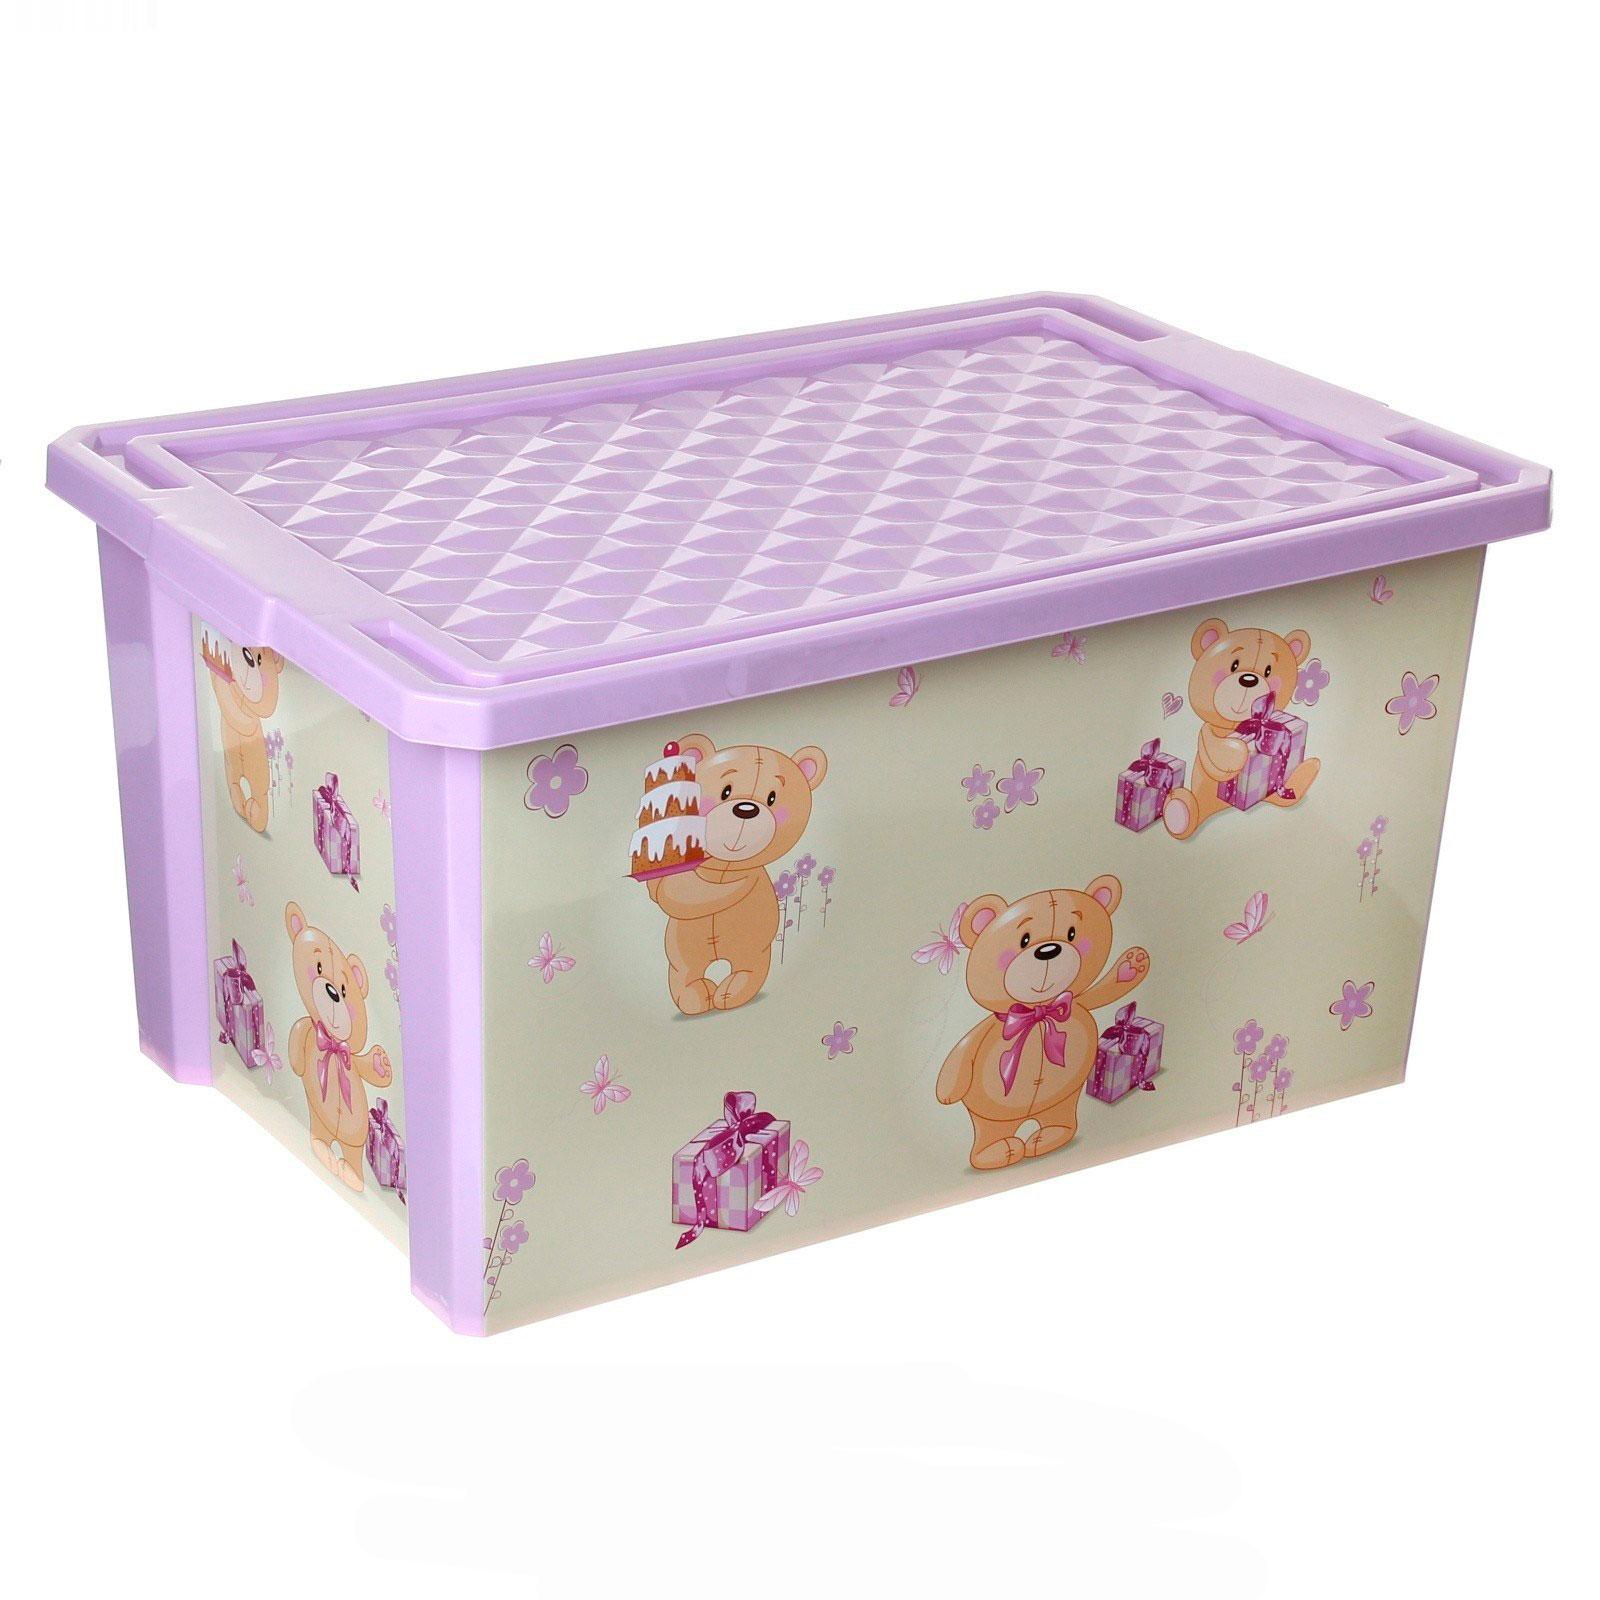 Ящик для хранения игрушек Little Angel X-Box Bears 57л на колесах Бежевый с розовым<br>